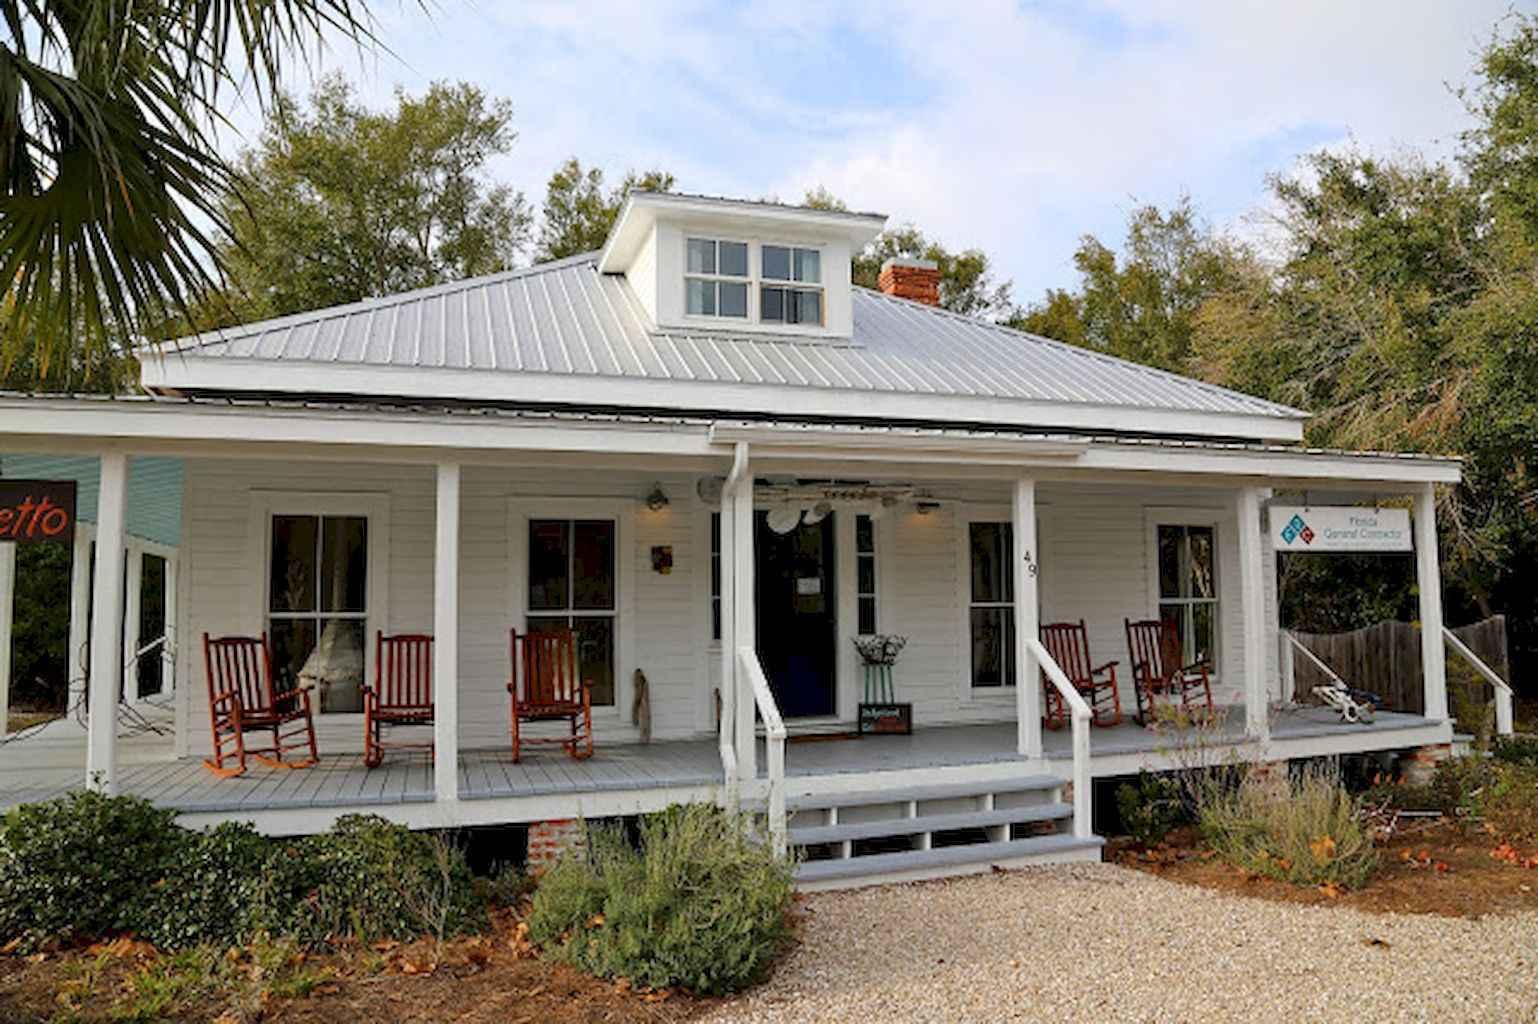 60 amazing farmhouse plans cracker style design ideas (24)